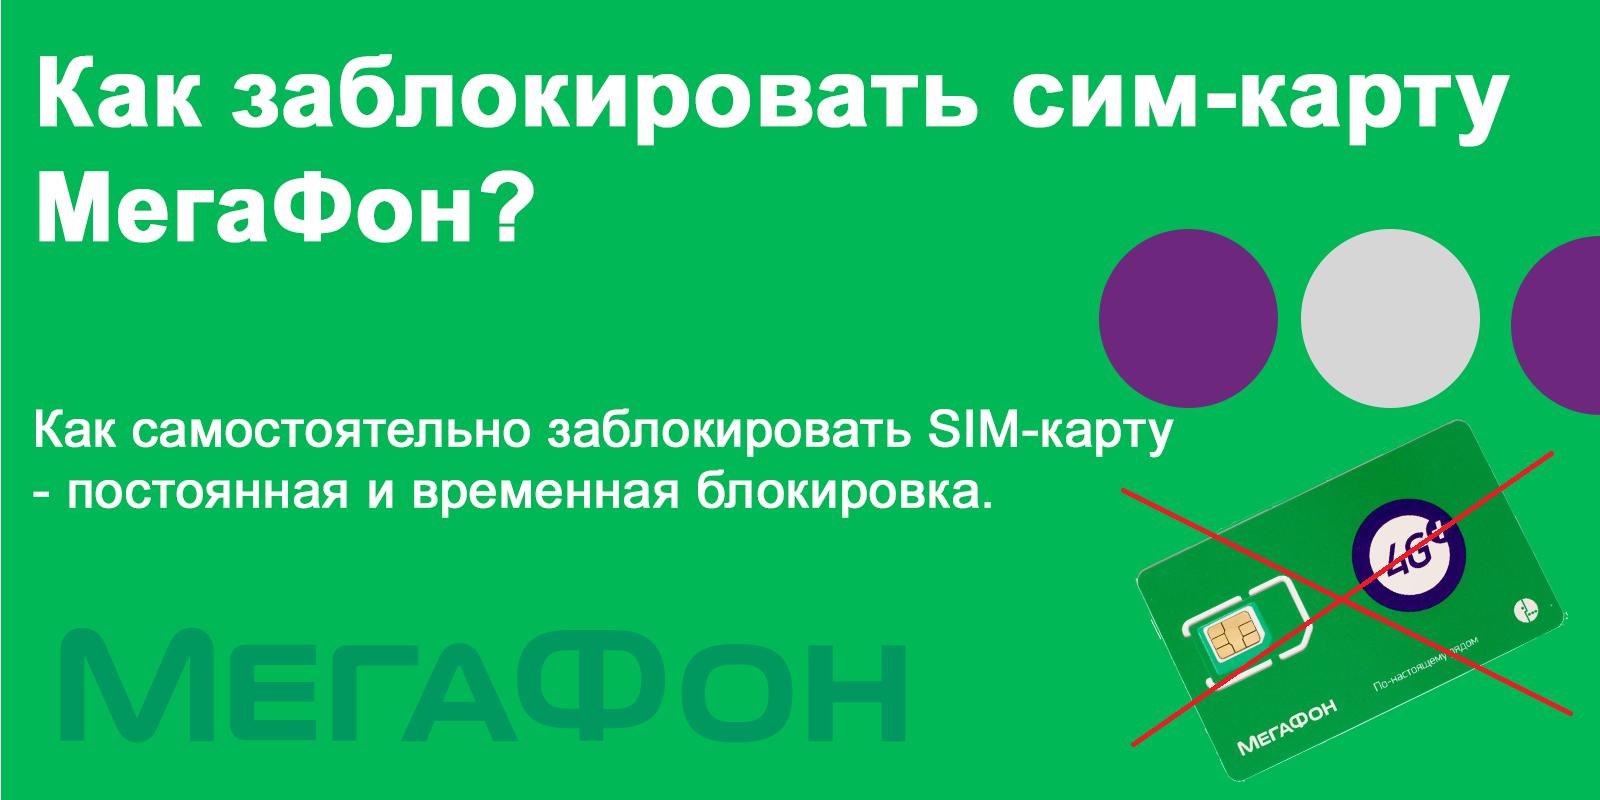 sim-karta-megafon-3.png